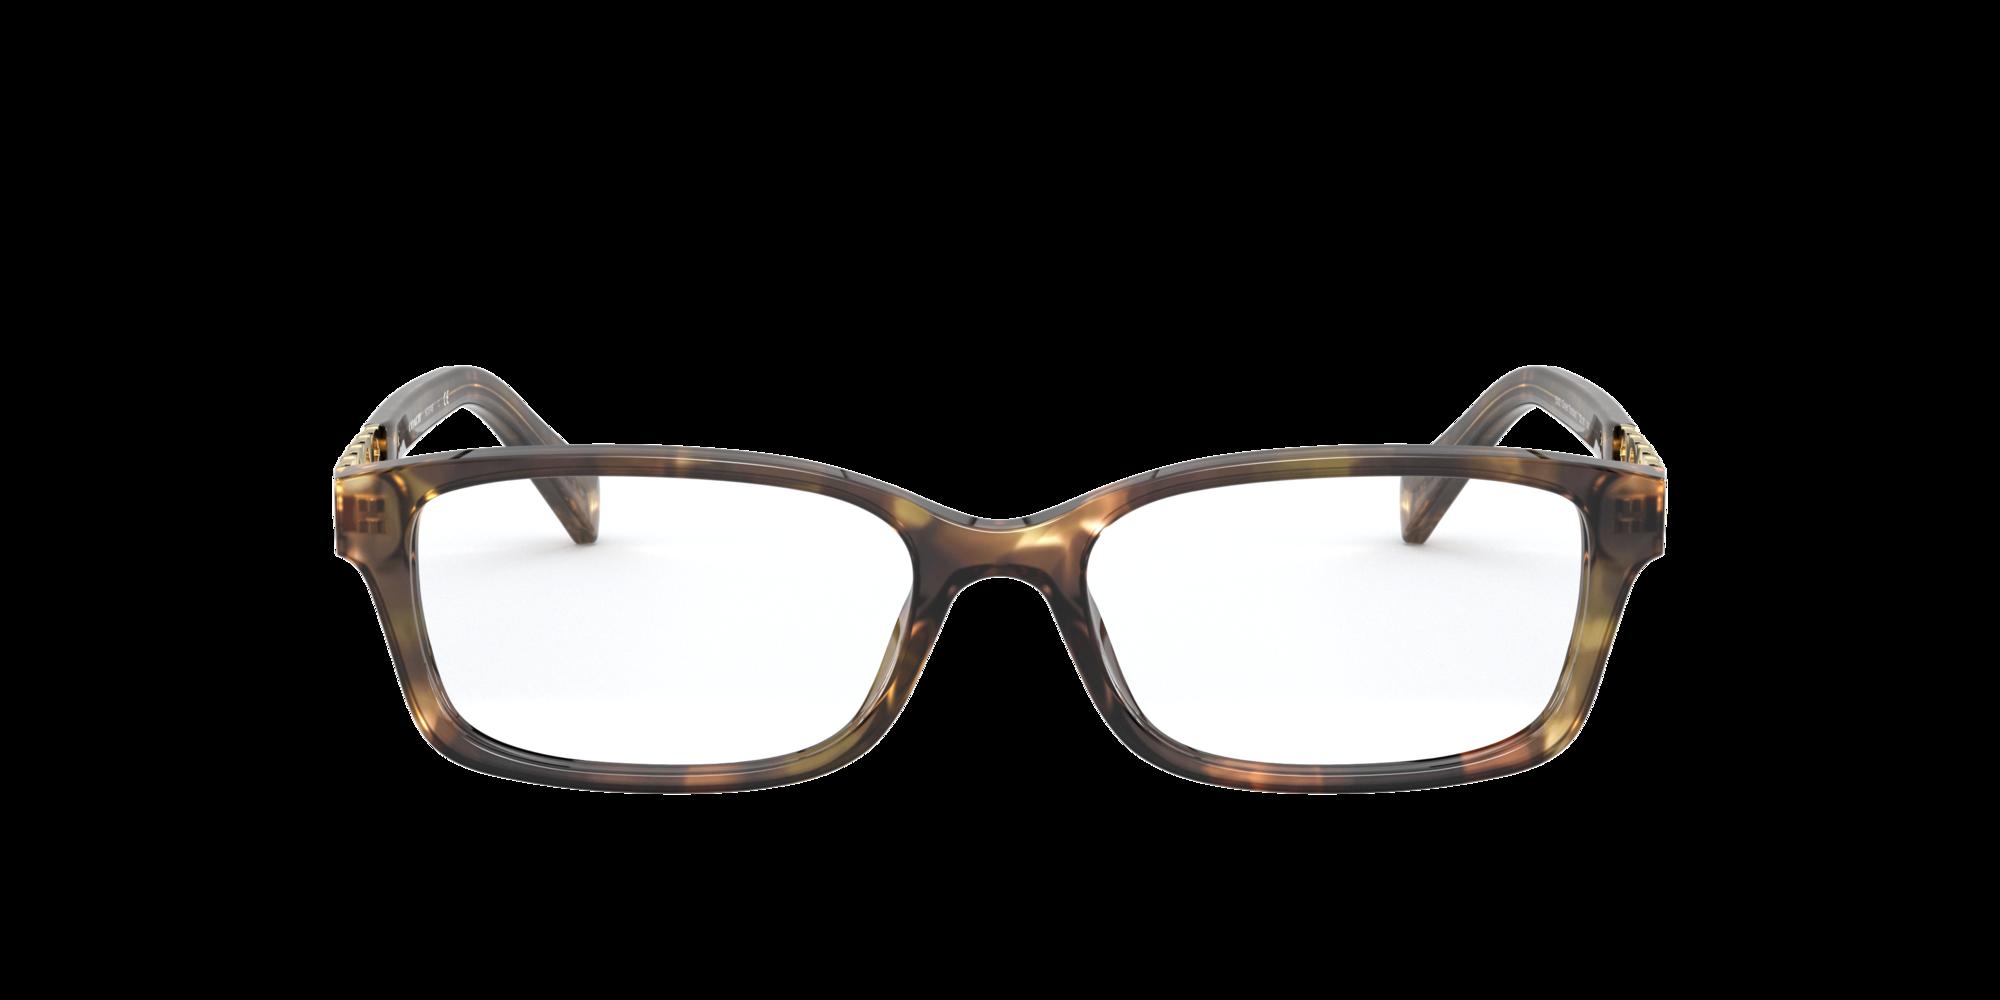 Image for HC6148 from LensCrafters | Glasses, Prescription Glasses Online, Eyewear